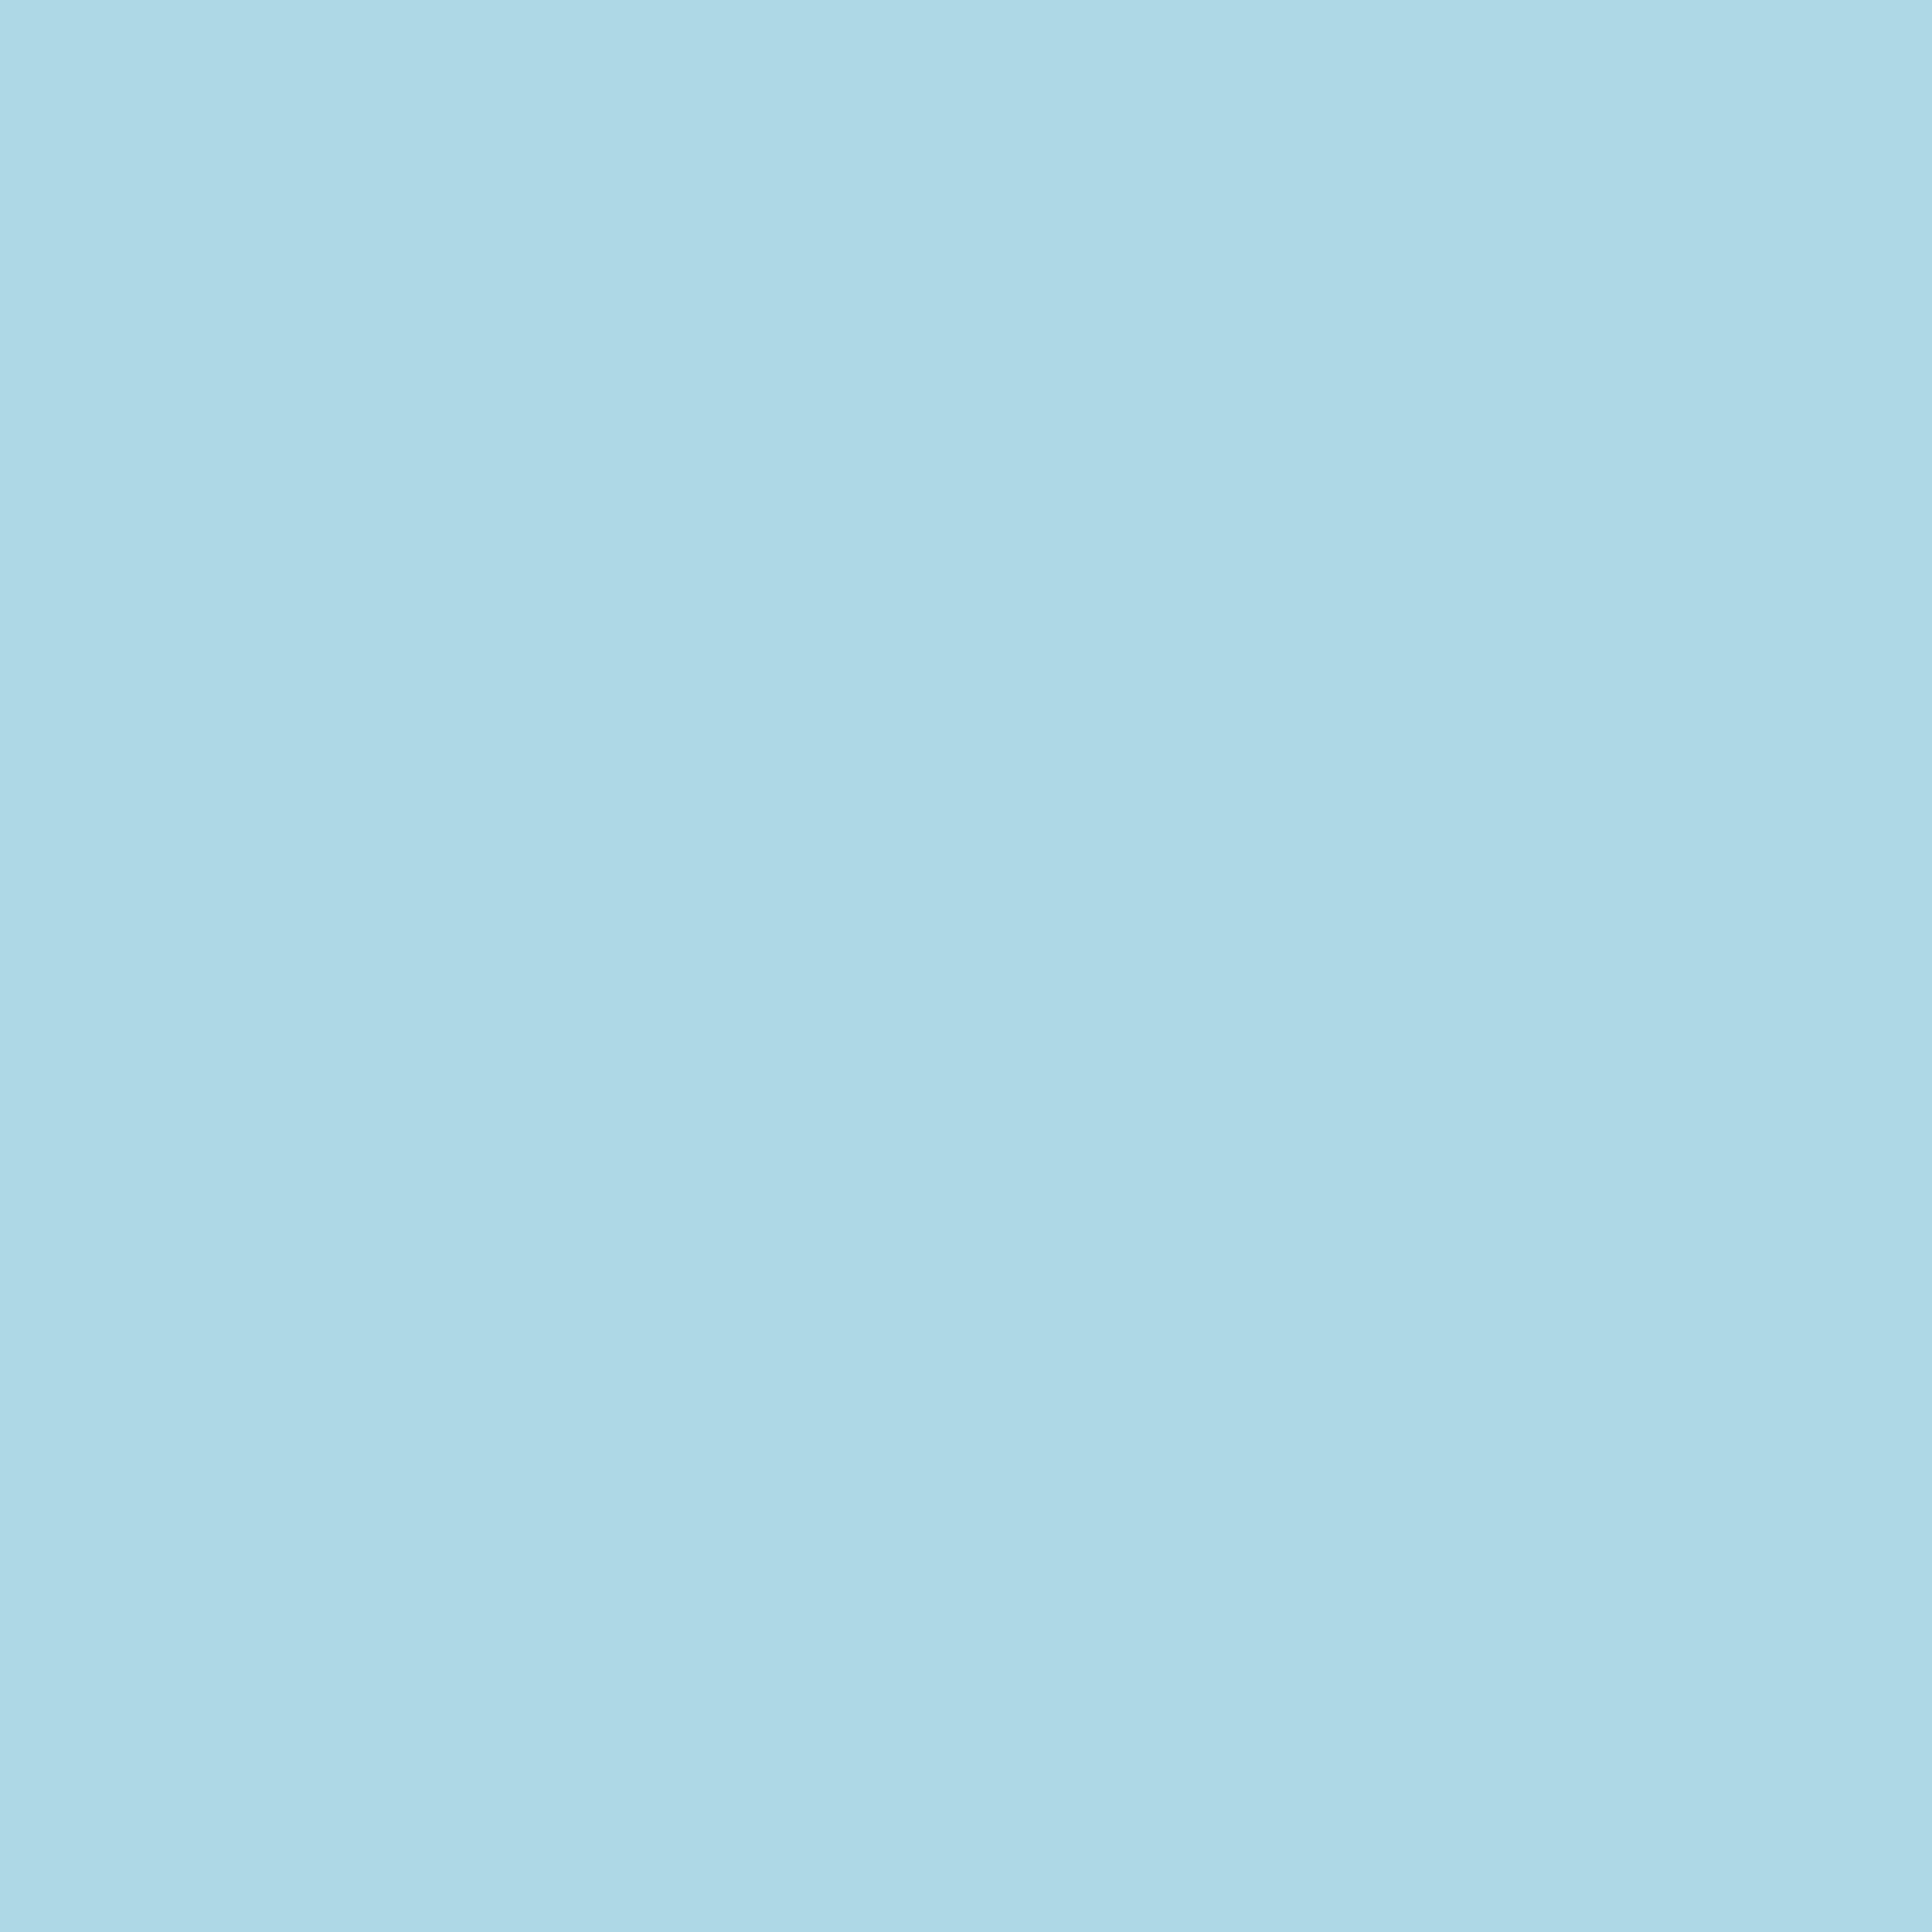 3600x3600 Light Blue Solid Color Background